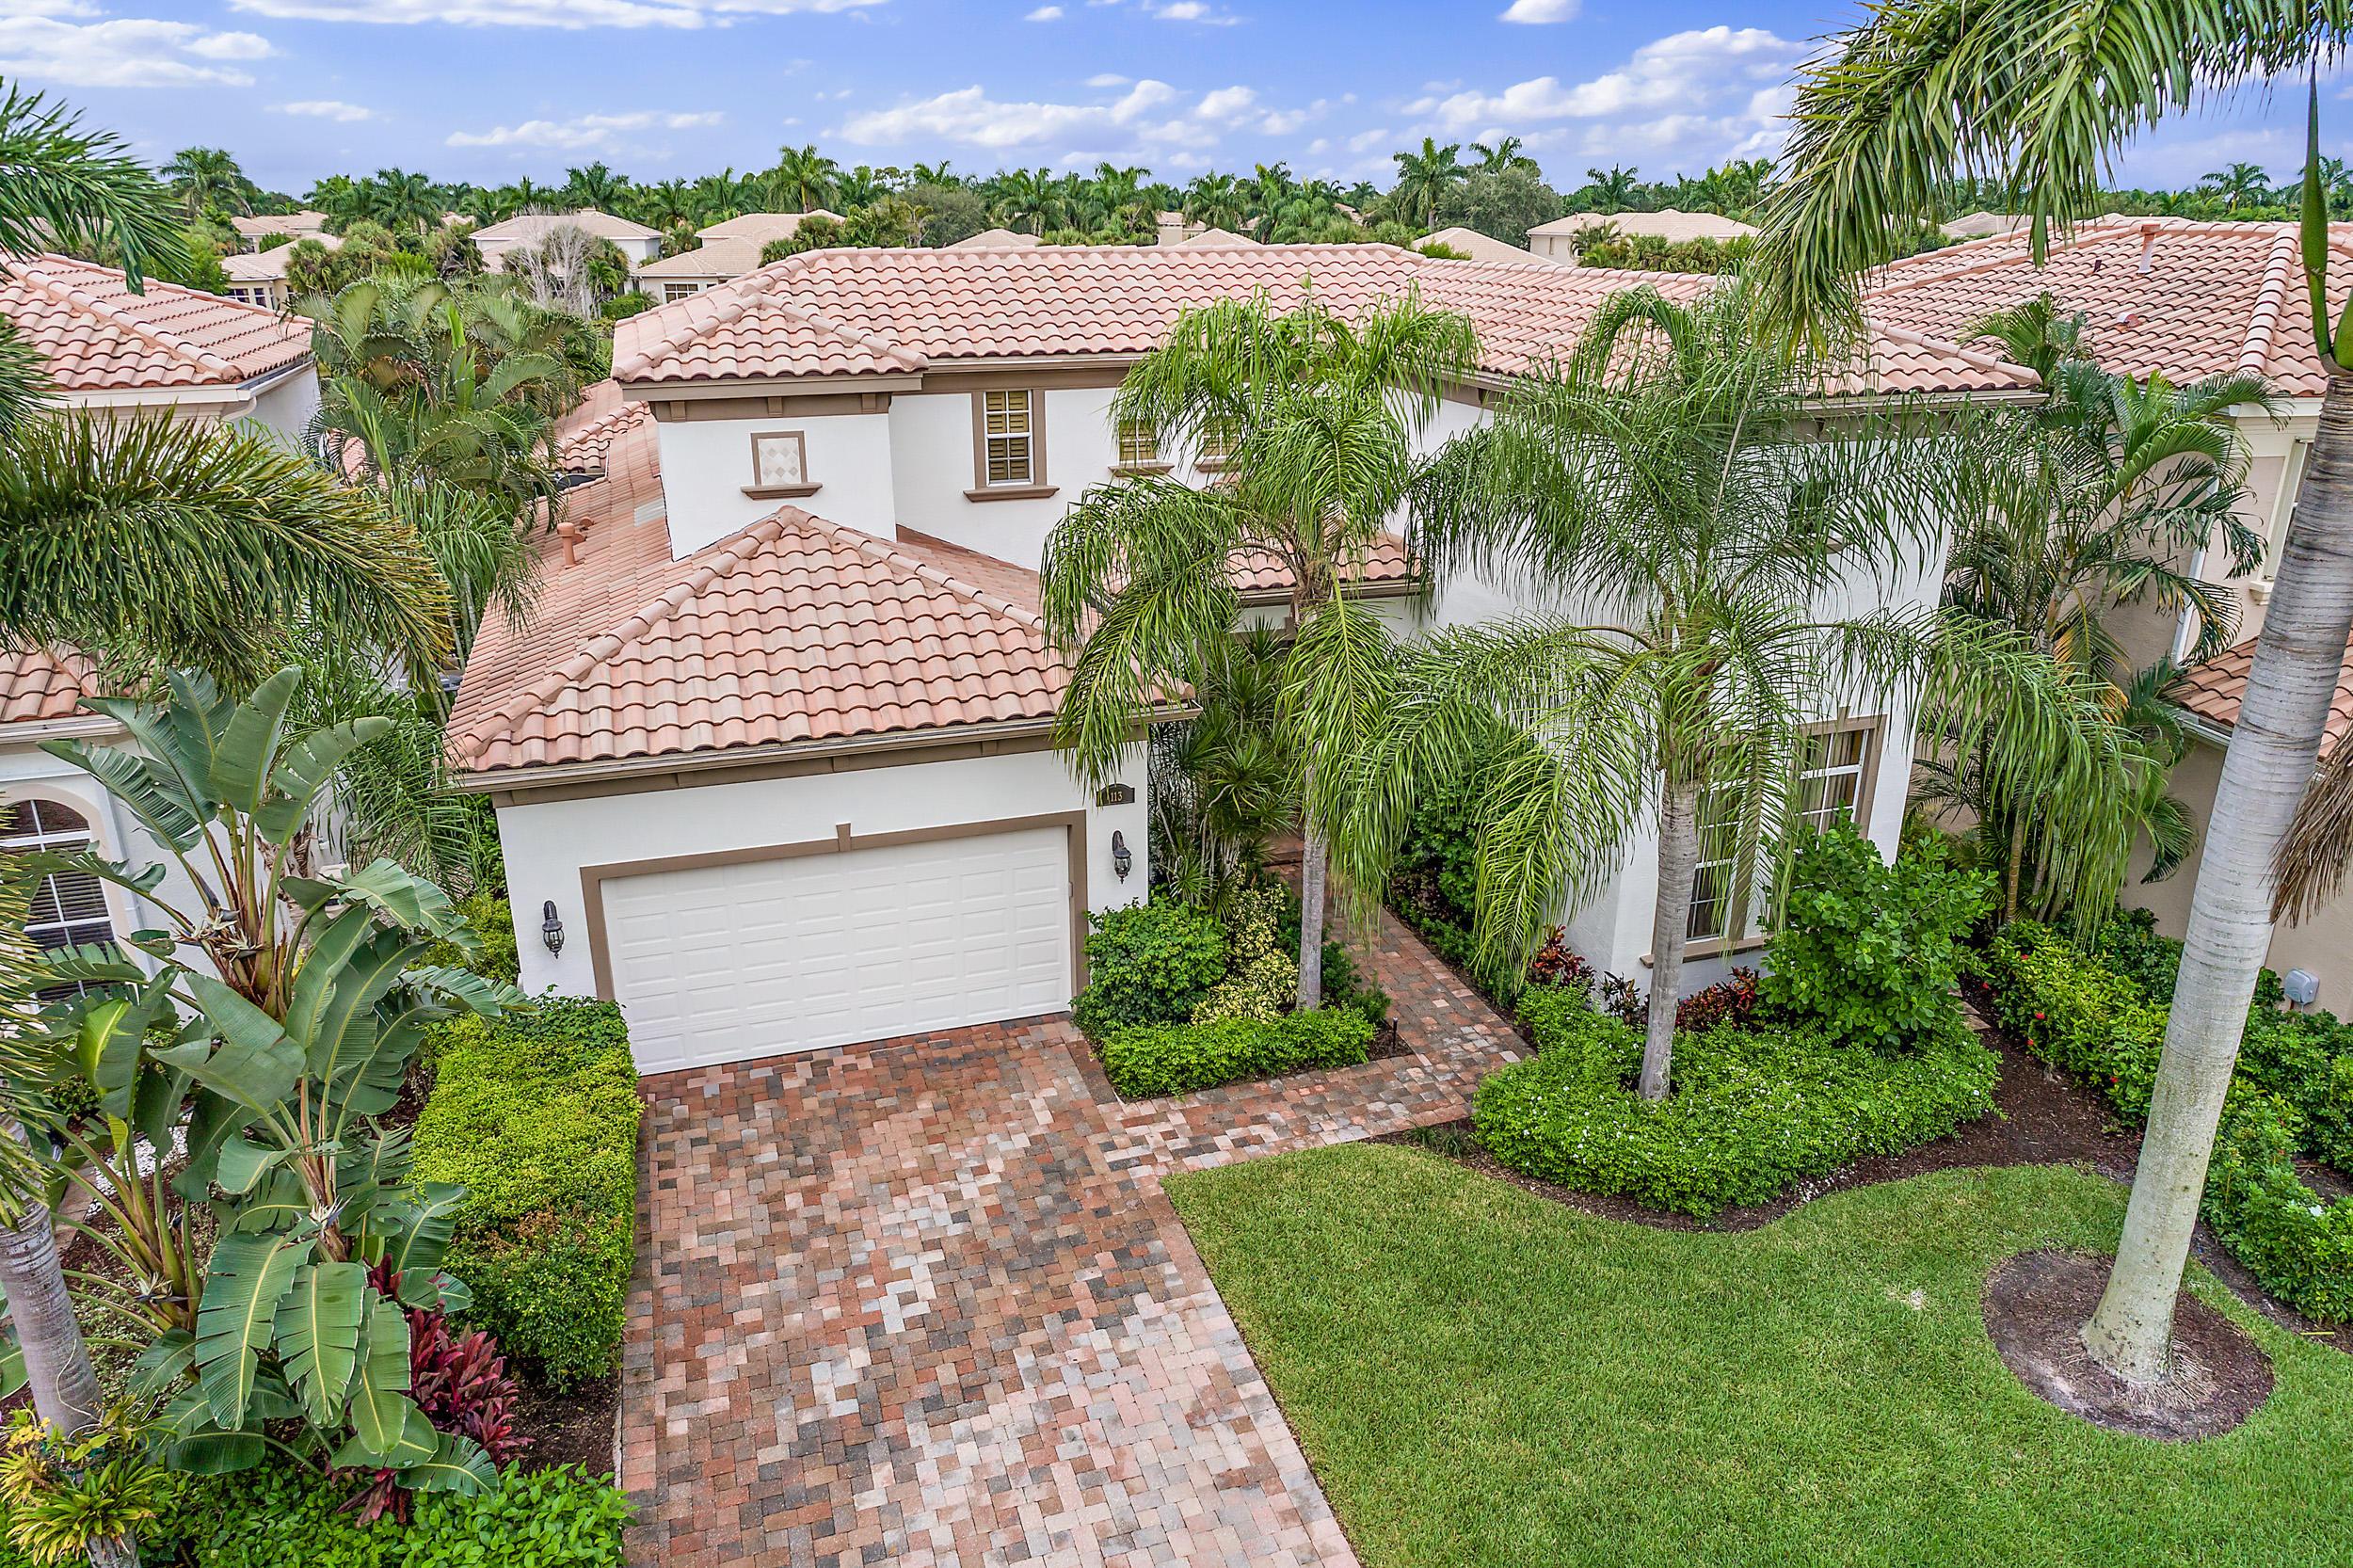 113 Siesta Way, Palm Beach Gardens, Florida 33418, 5 Bedrooms Bedrooms, ,5.1 BathroomsBathrooms,A,Single family,Siesta,RX-10616675